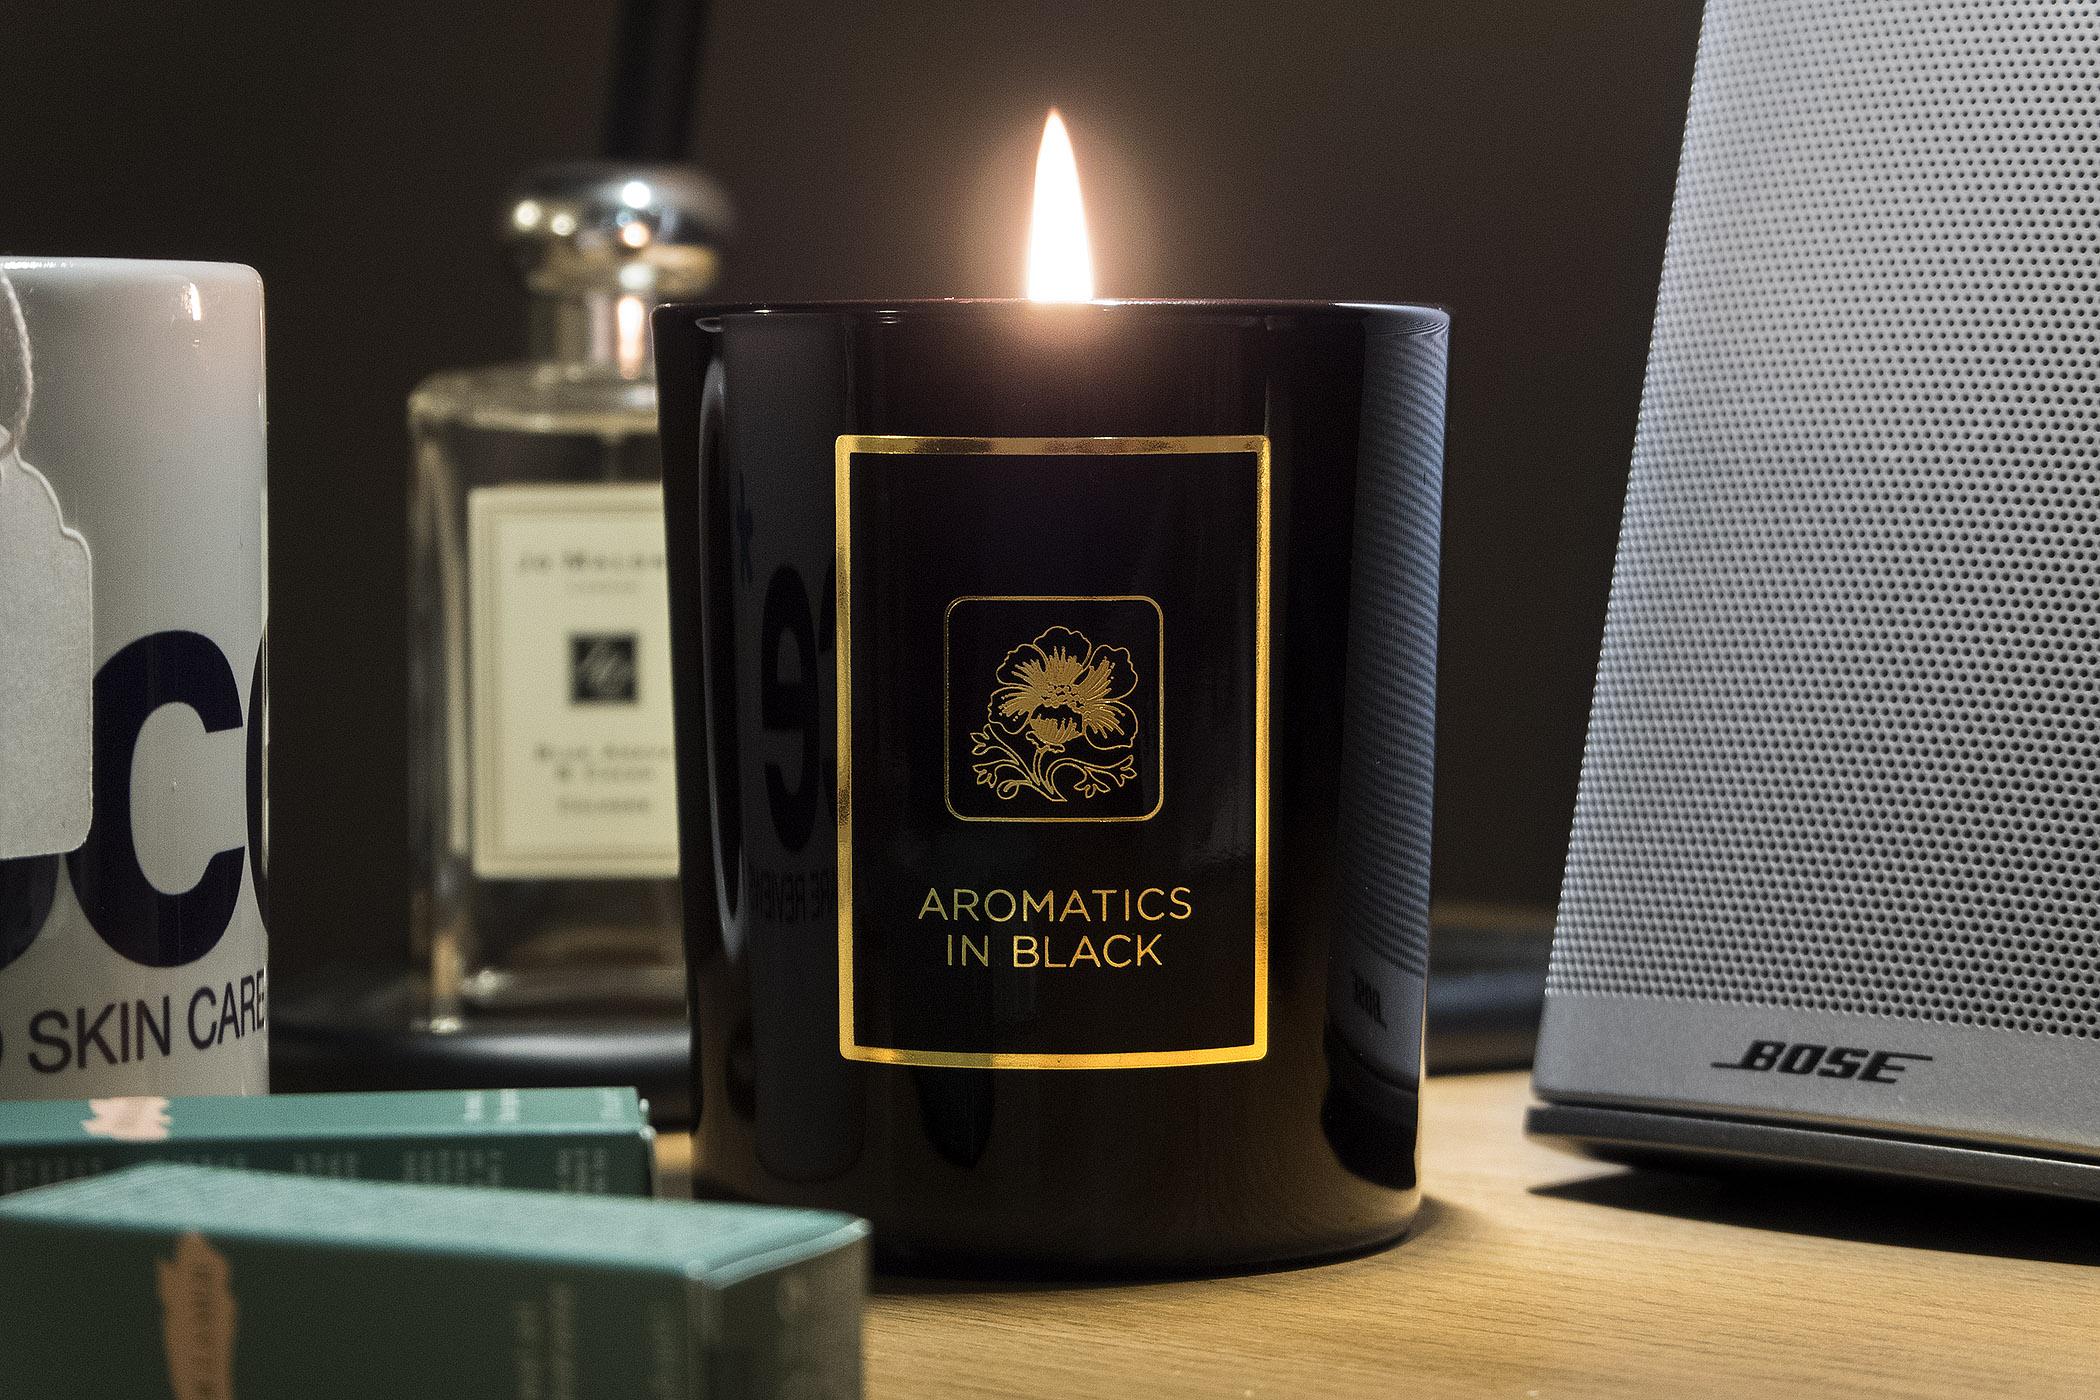 NEW Clinique Aromatics in Black Candle